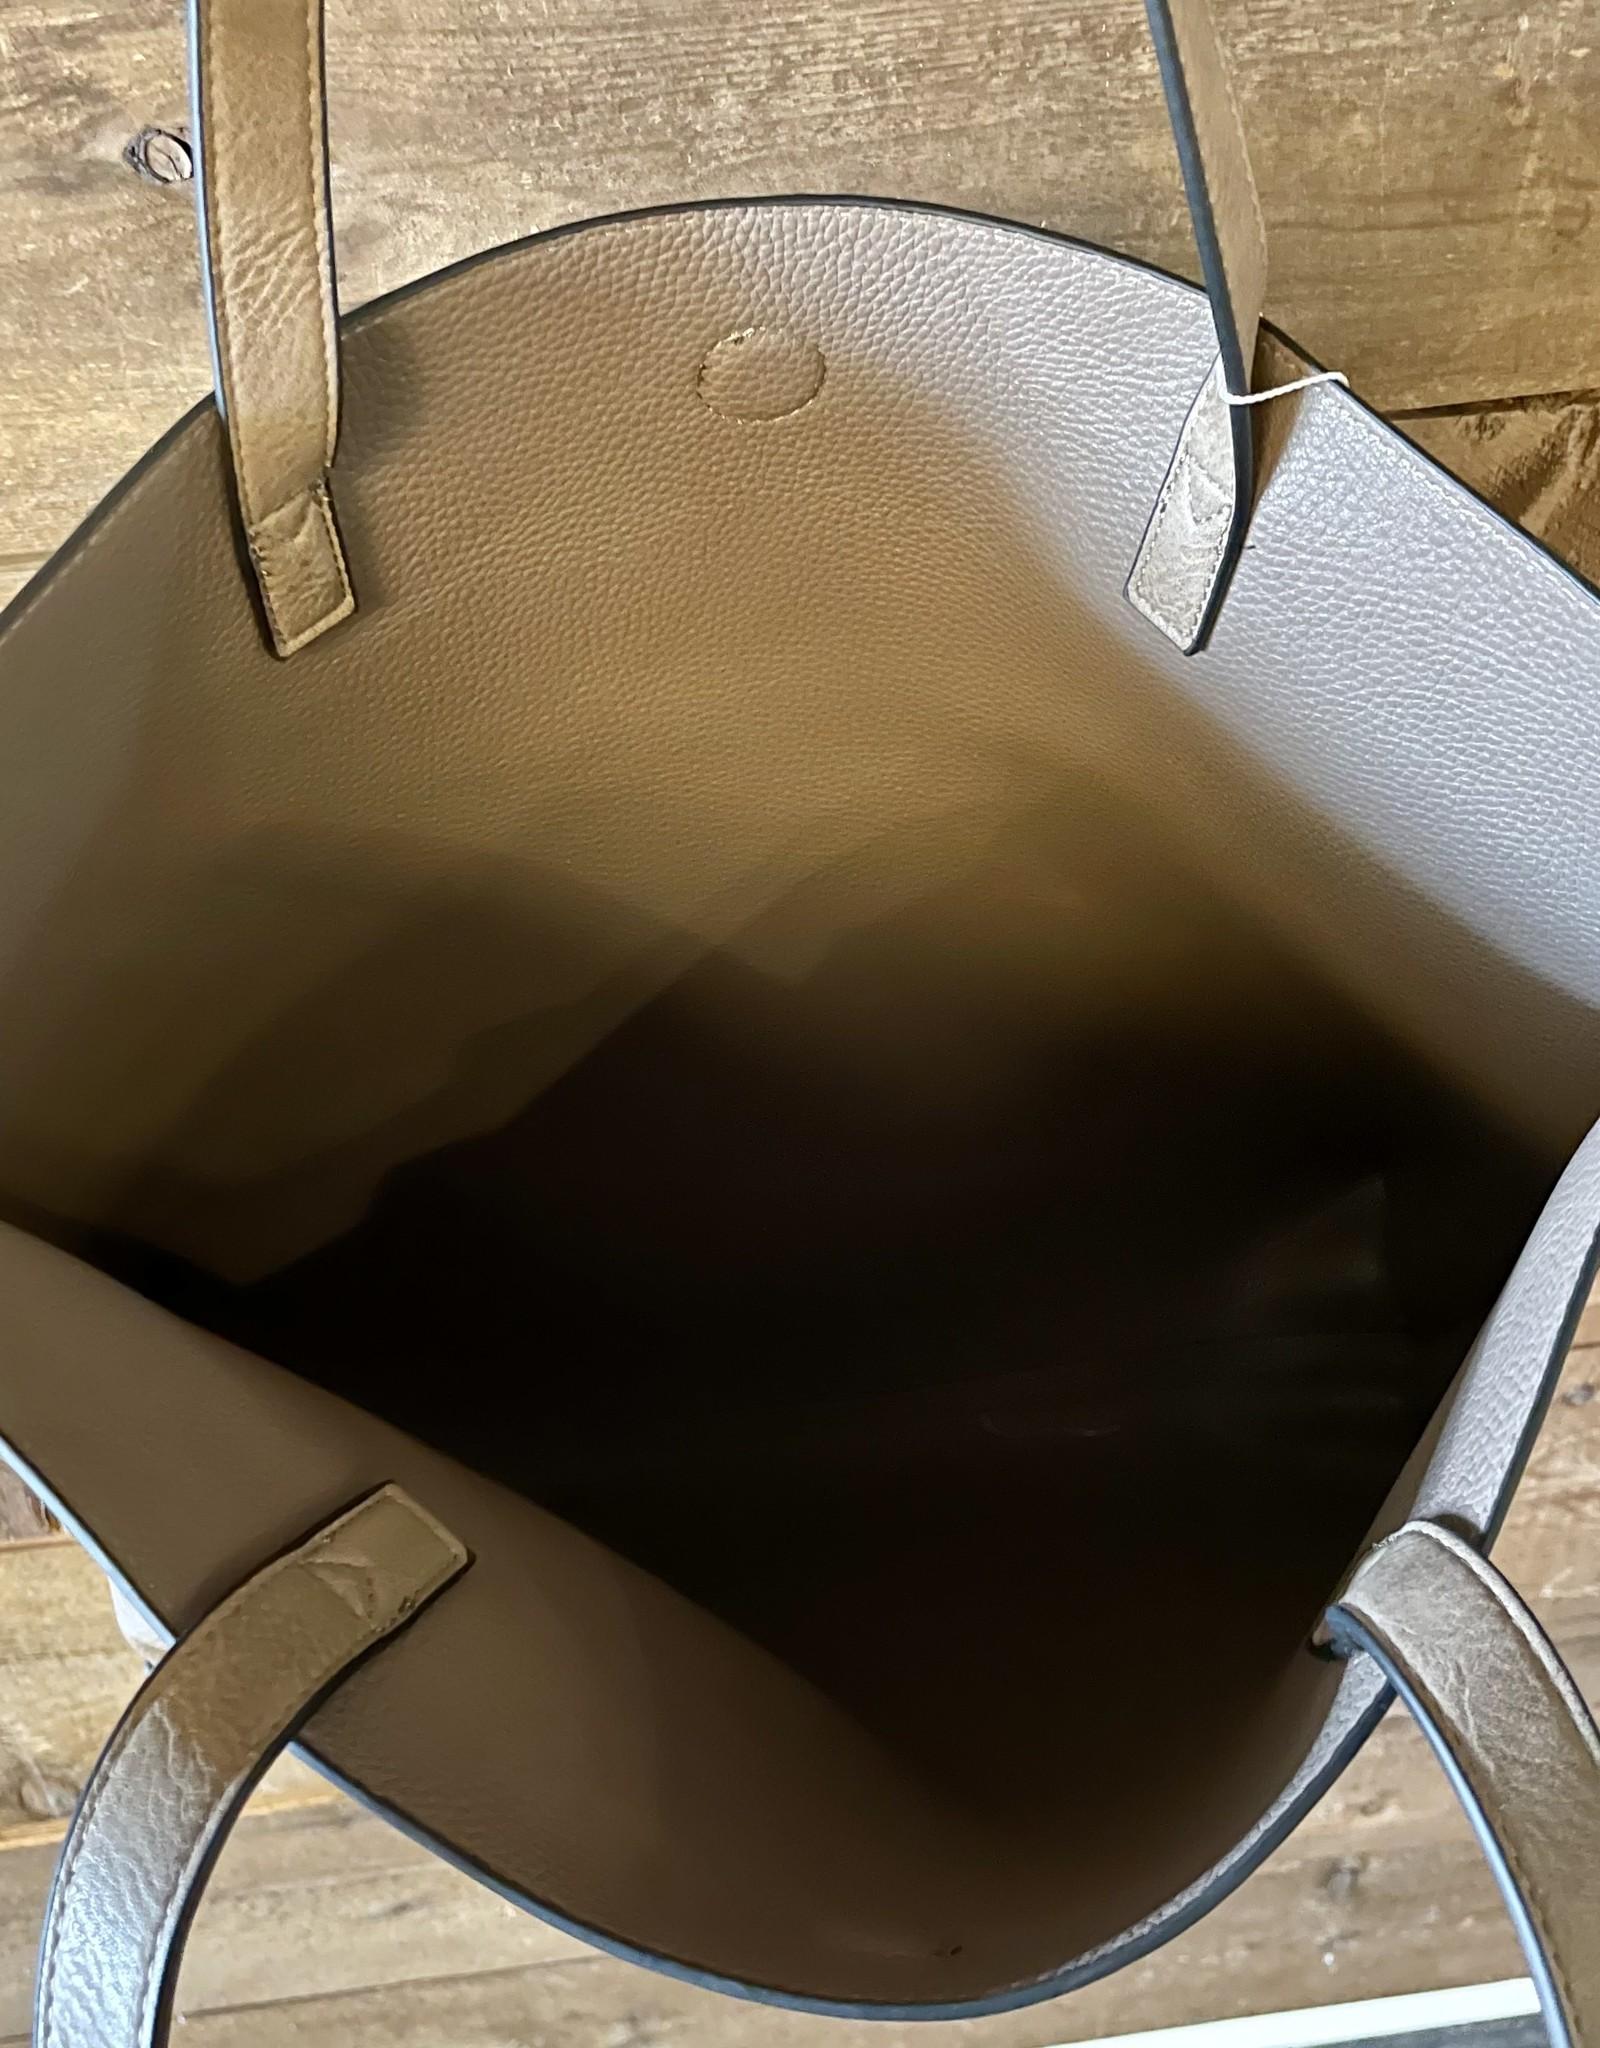 Blue Suede Contrast Tote Bag with Additional Shoulder Bag and Tassel